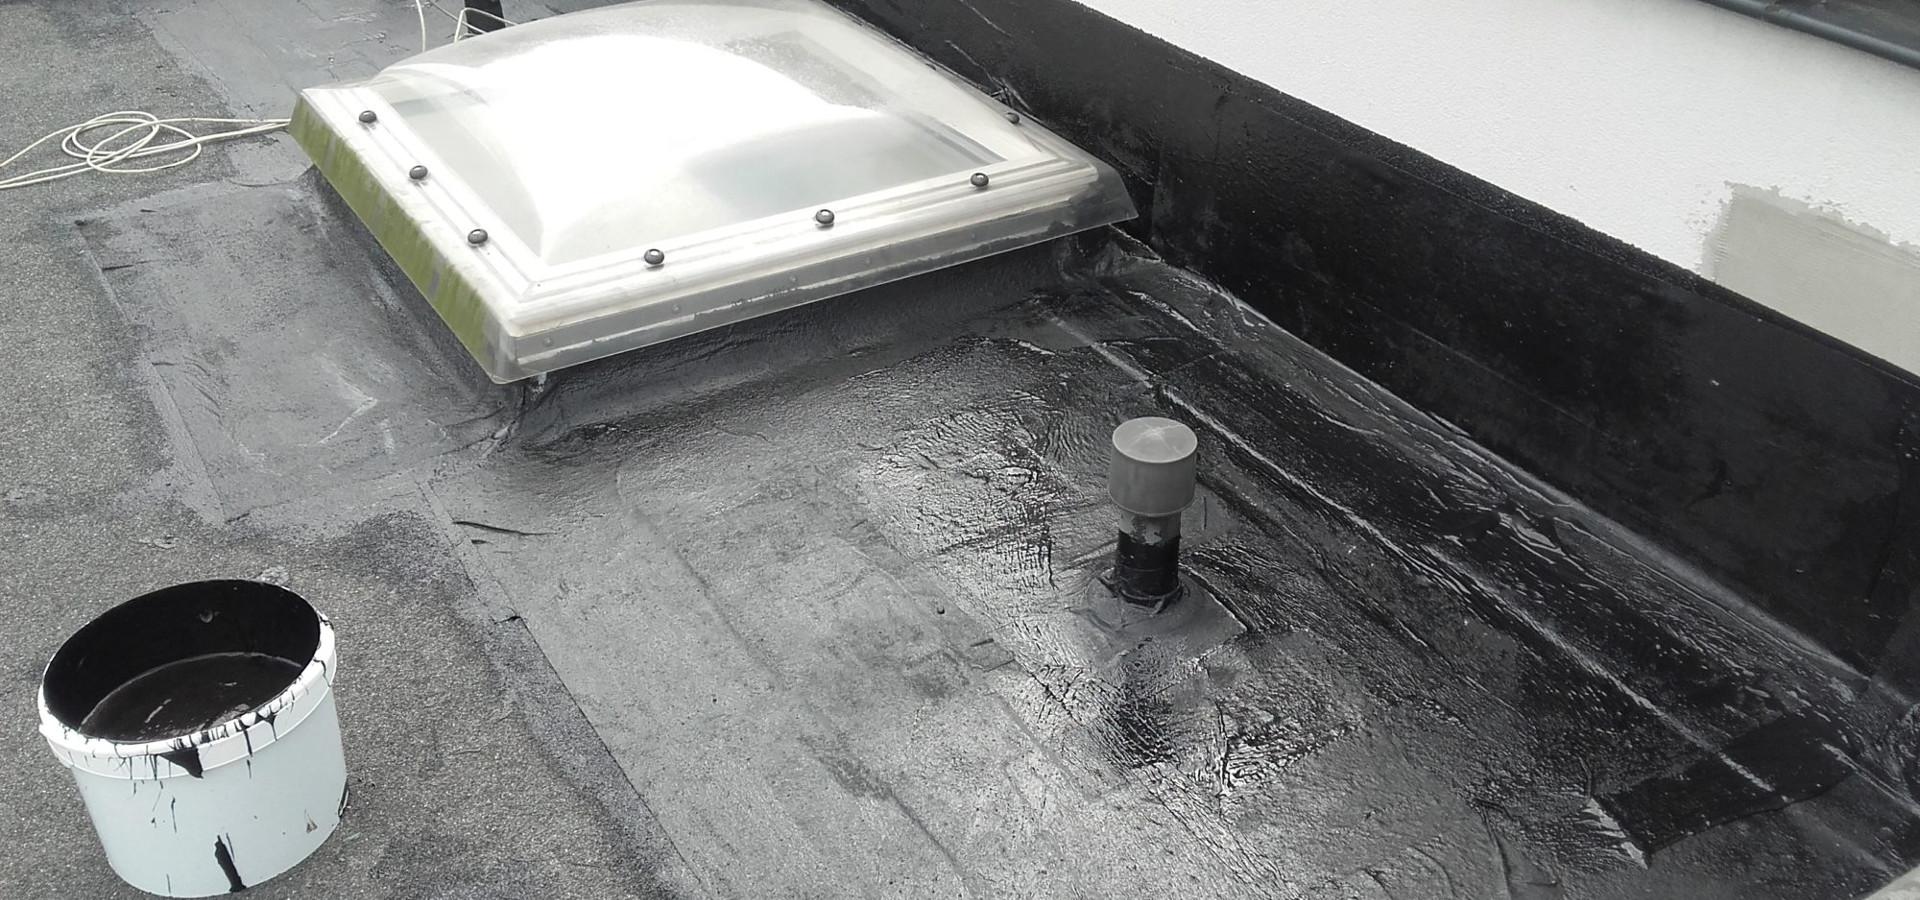 Naprawa dachu z papy